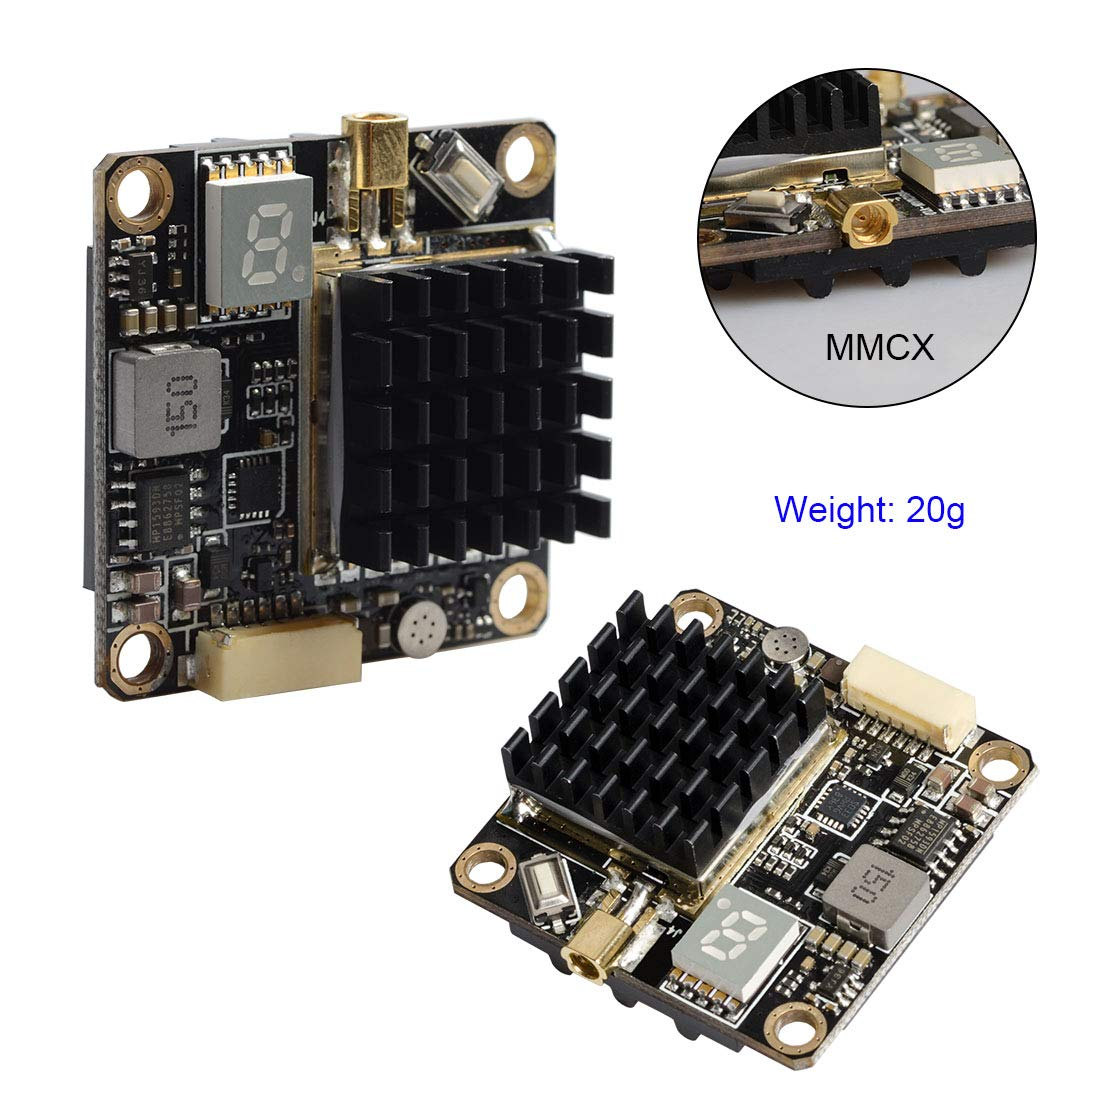 Wirelessan 5.8GHz 250mW/500mW/1000mW/2000mW Power Long Range Switchable FPV Transmitter with MMCX and FC Uart by Wirelessan (Image #2)